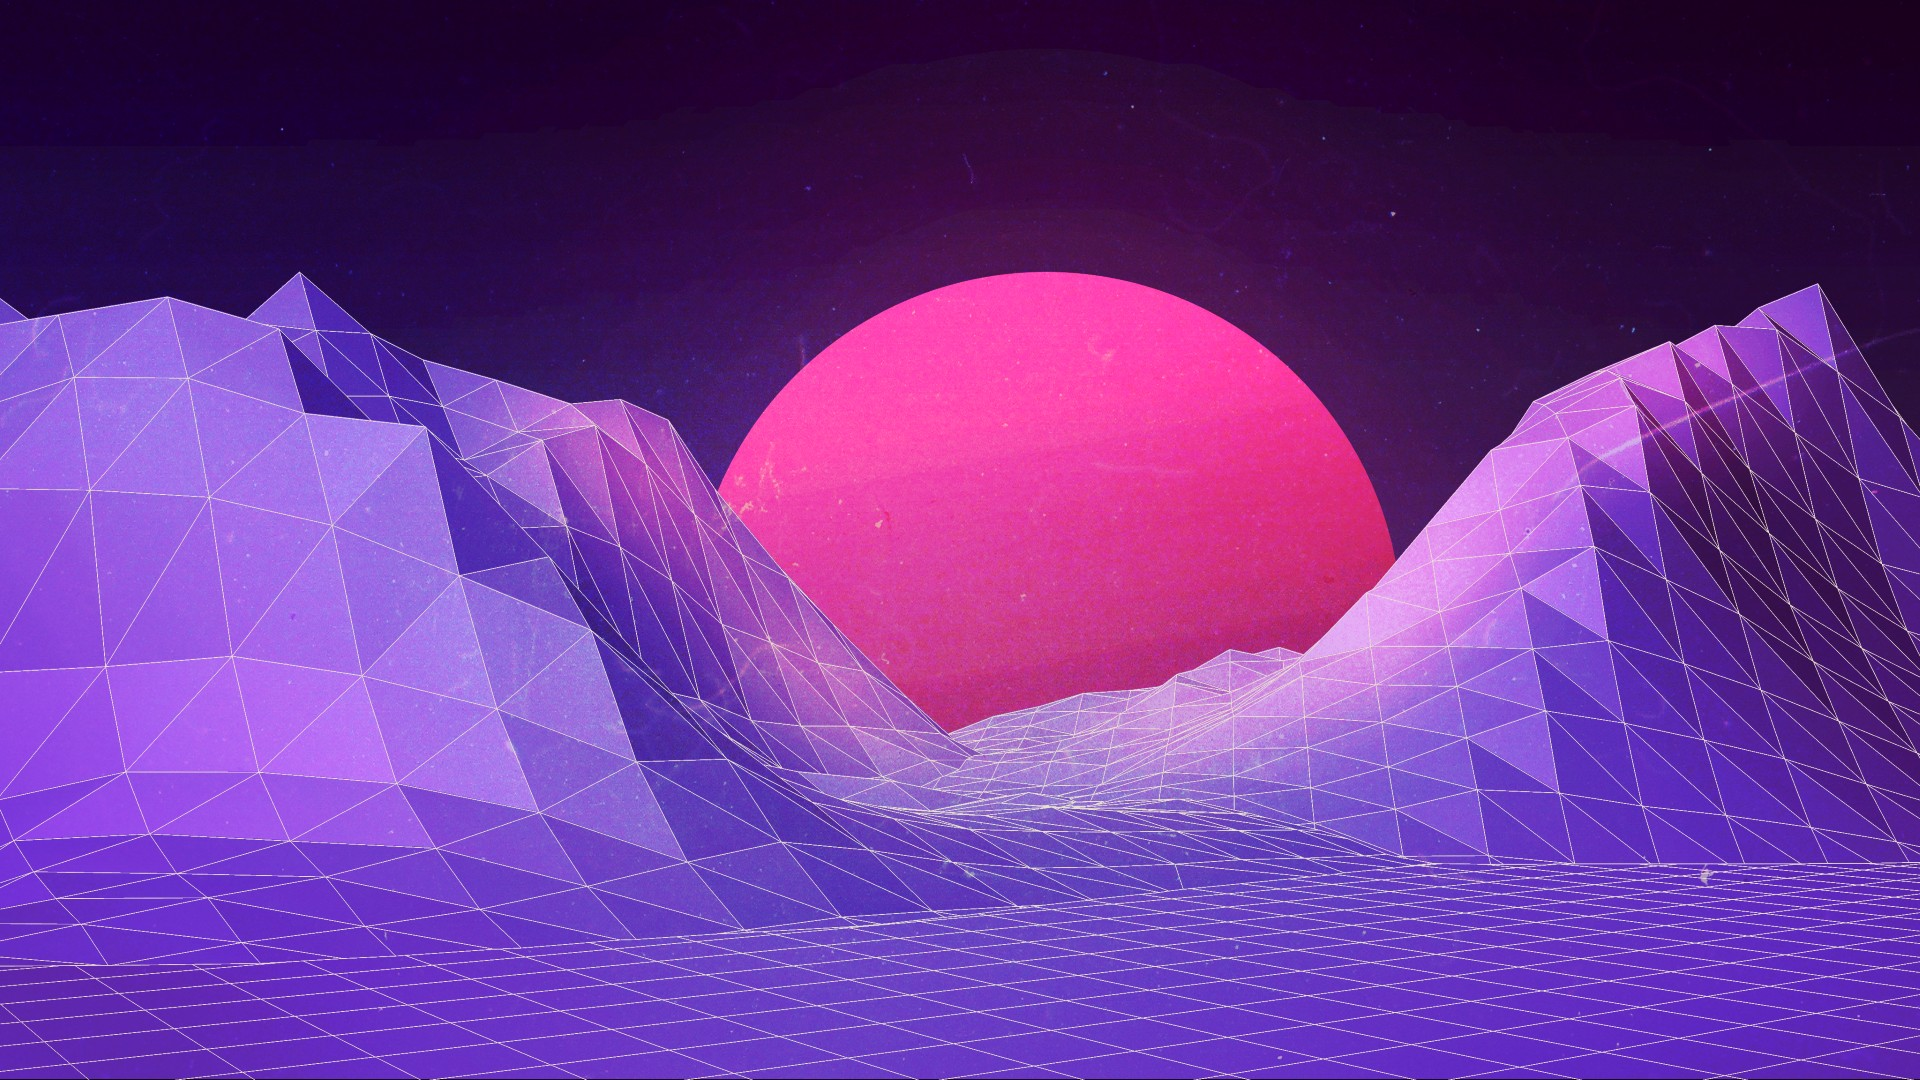 Vaporwave Background Download Free Stunning High